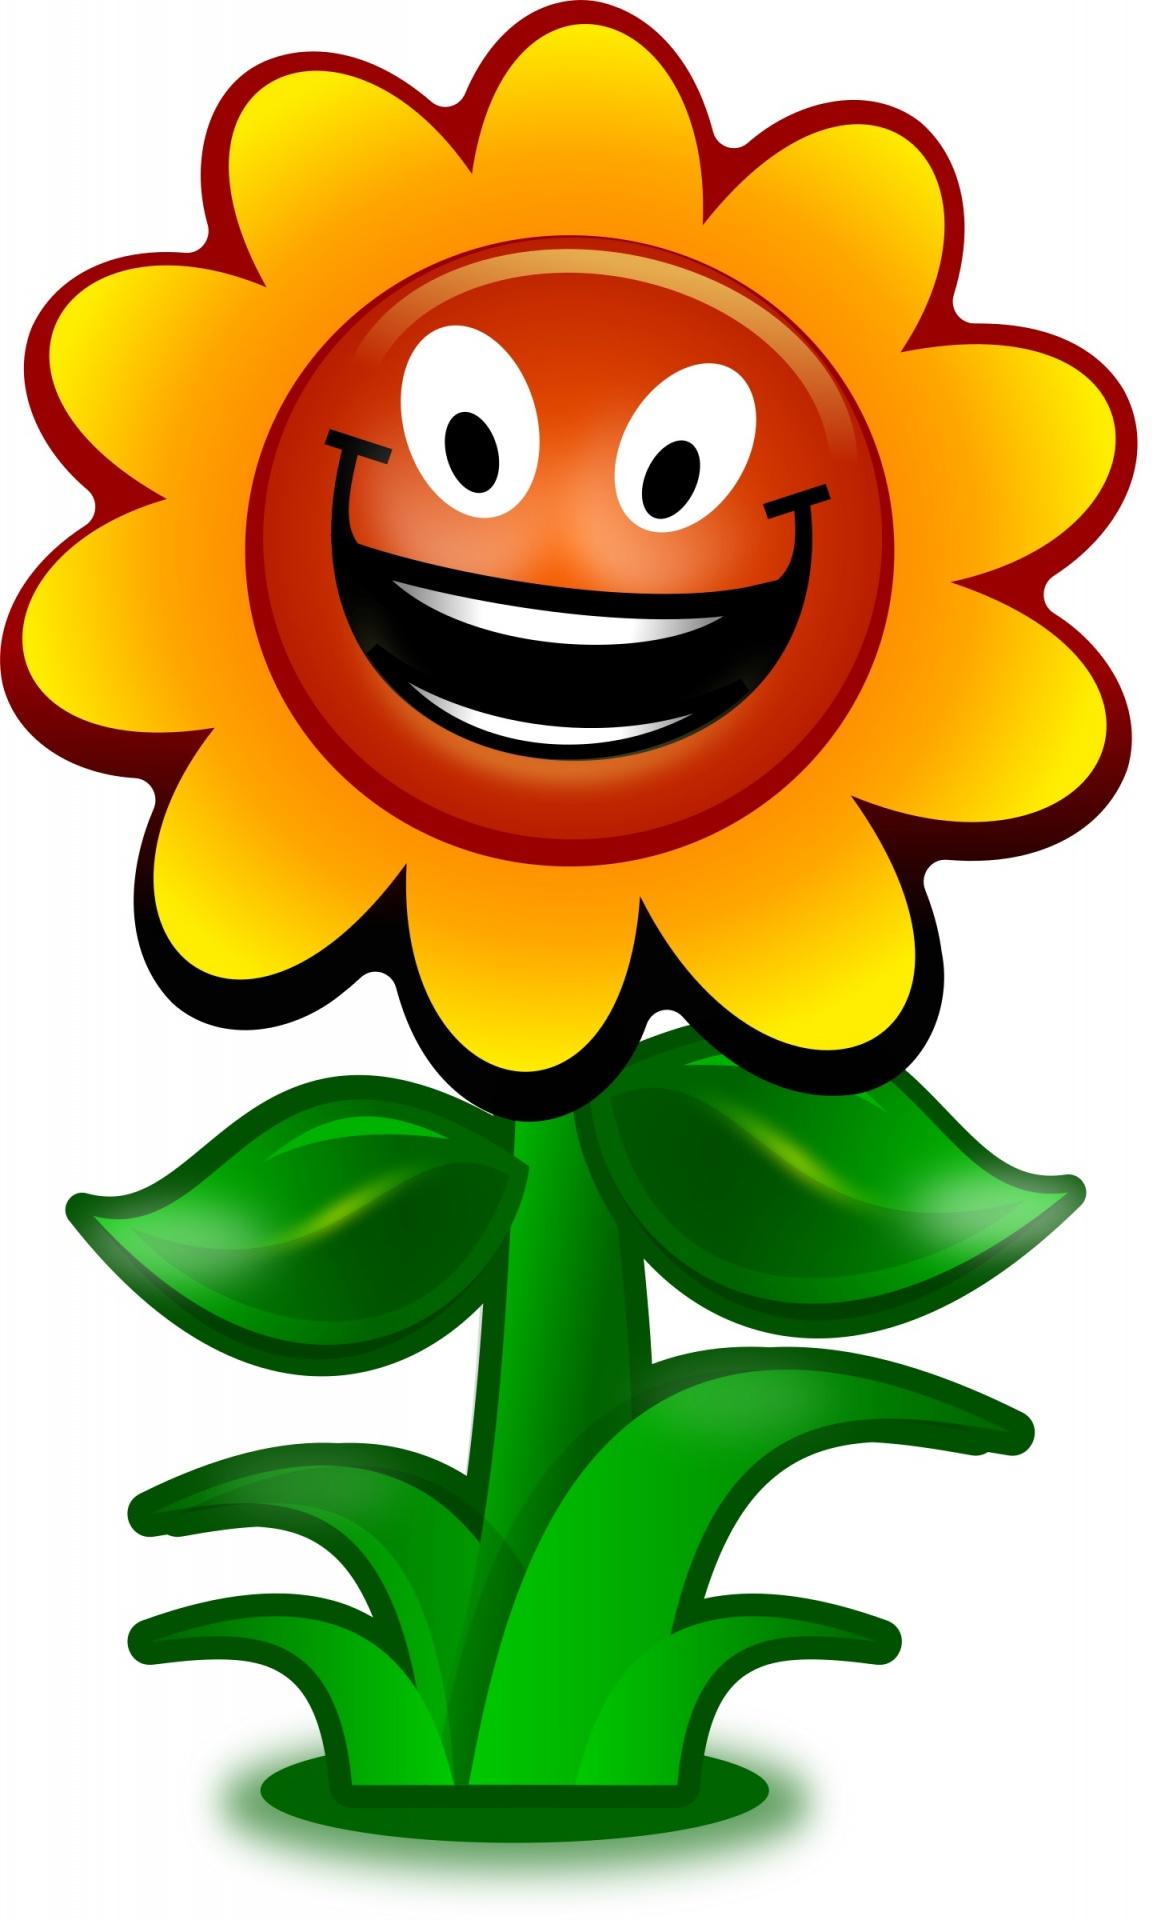 Sunflower Flower Cartoon Art Background Free Image From Needpix Com